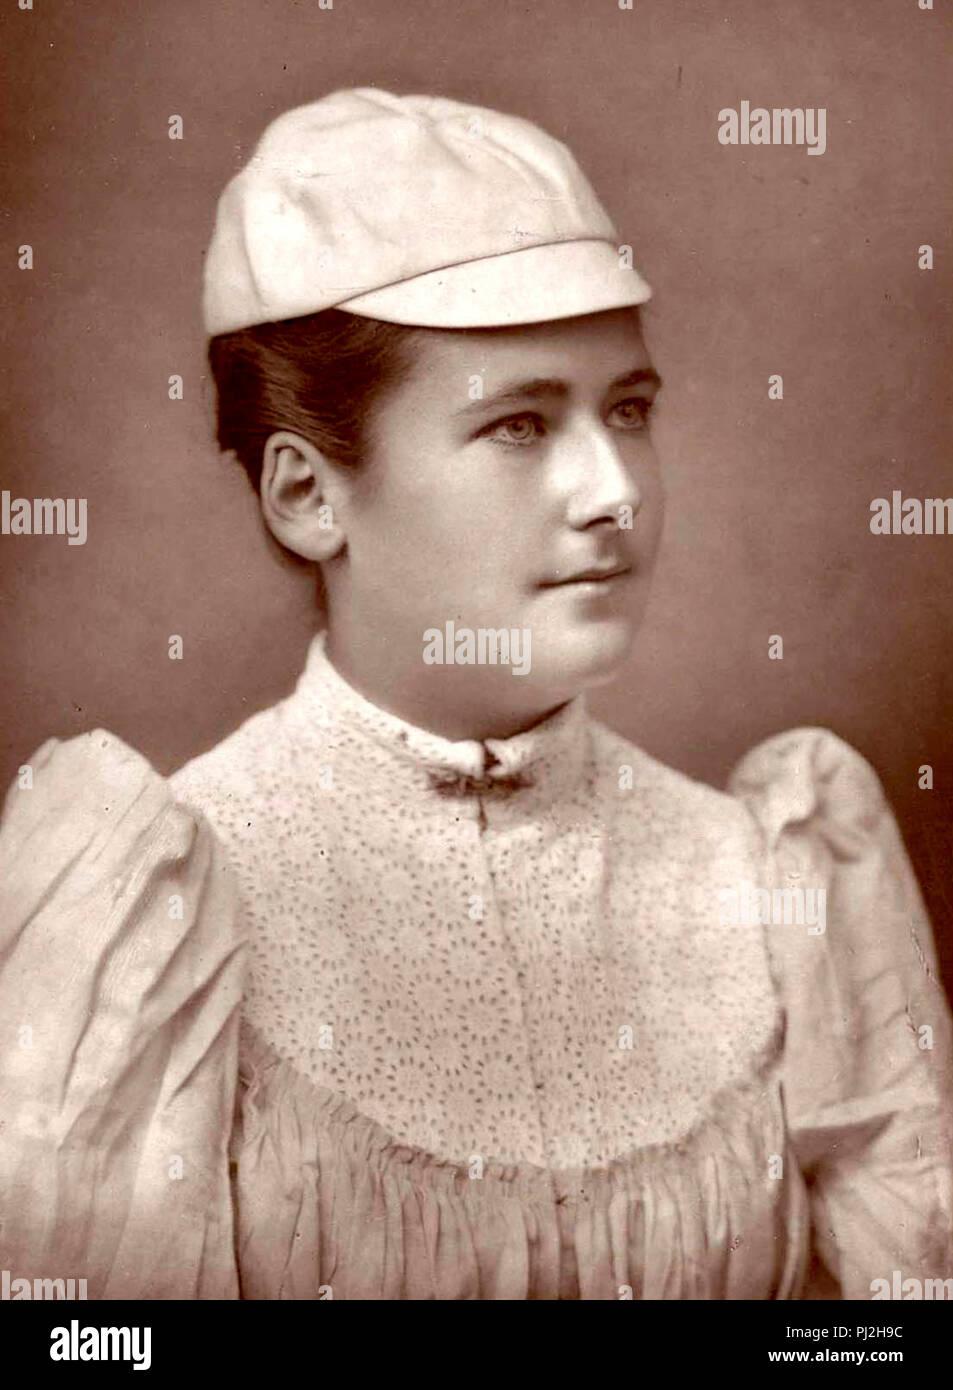 Lottie Dod, Charlotte 'Lottie' Dod (1871 – 1960) English tennis player. She won the Wimbledon Ladies' Singles Championship five times - Stock Image